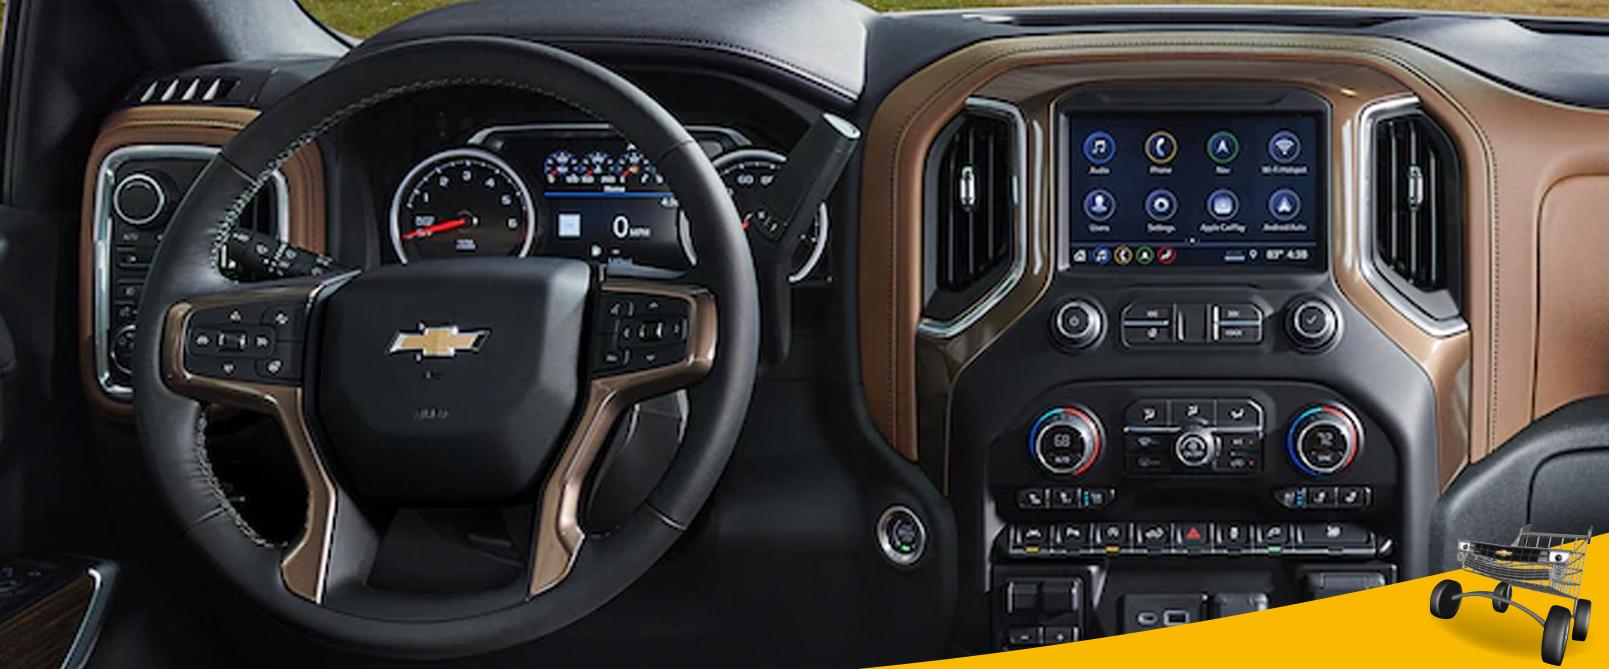 2020 Chevy Silverado Technology